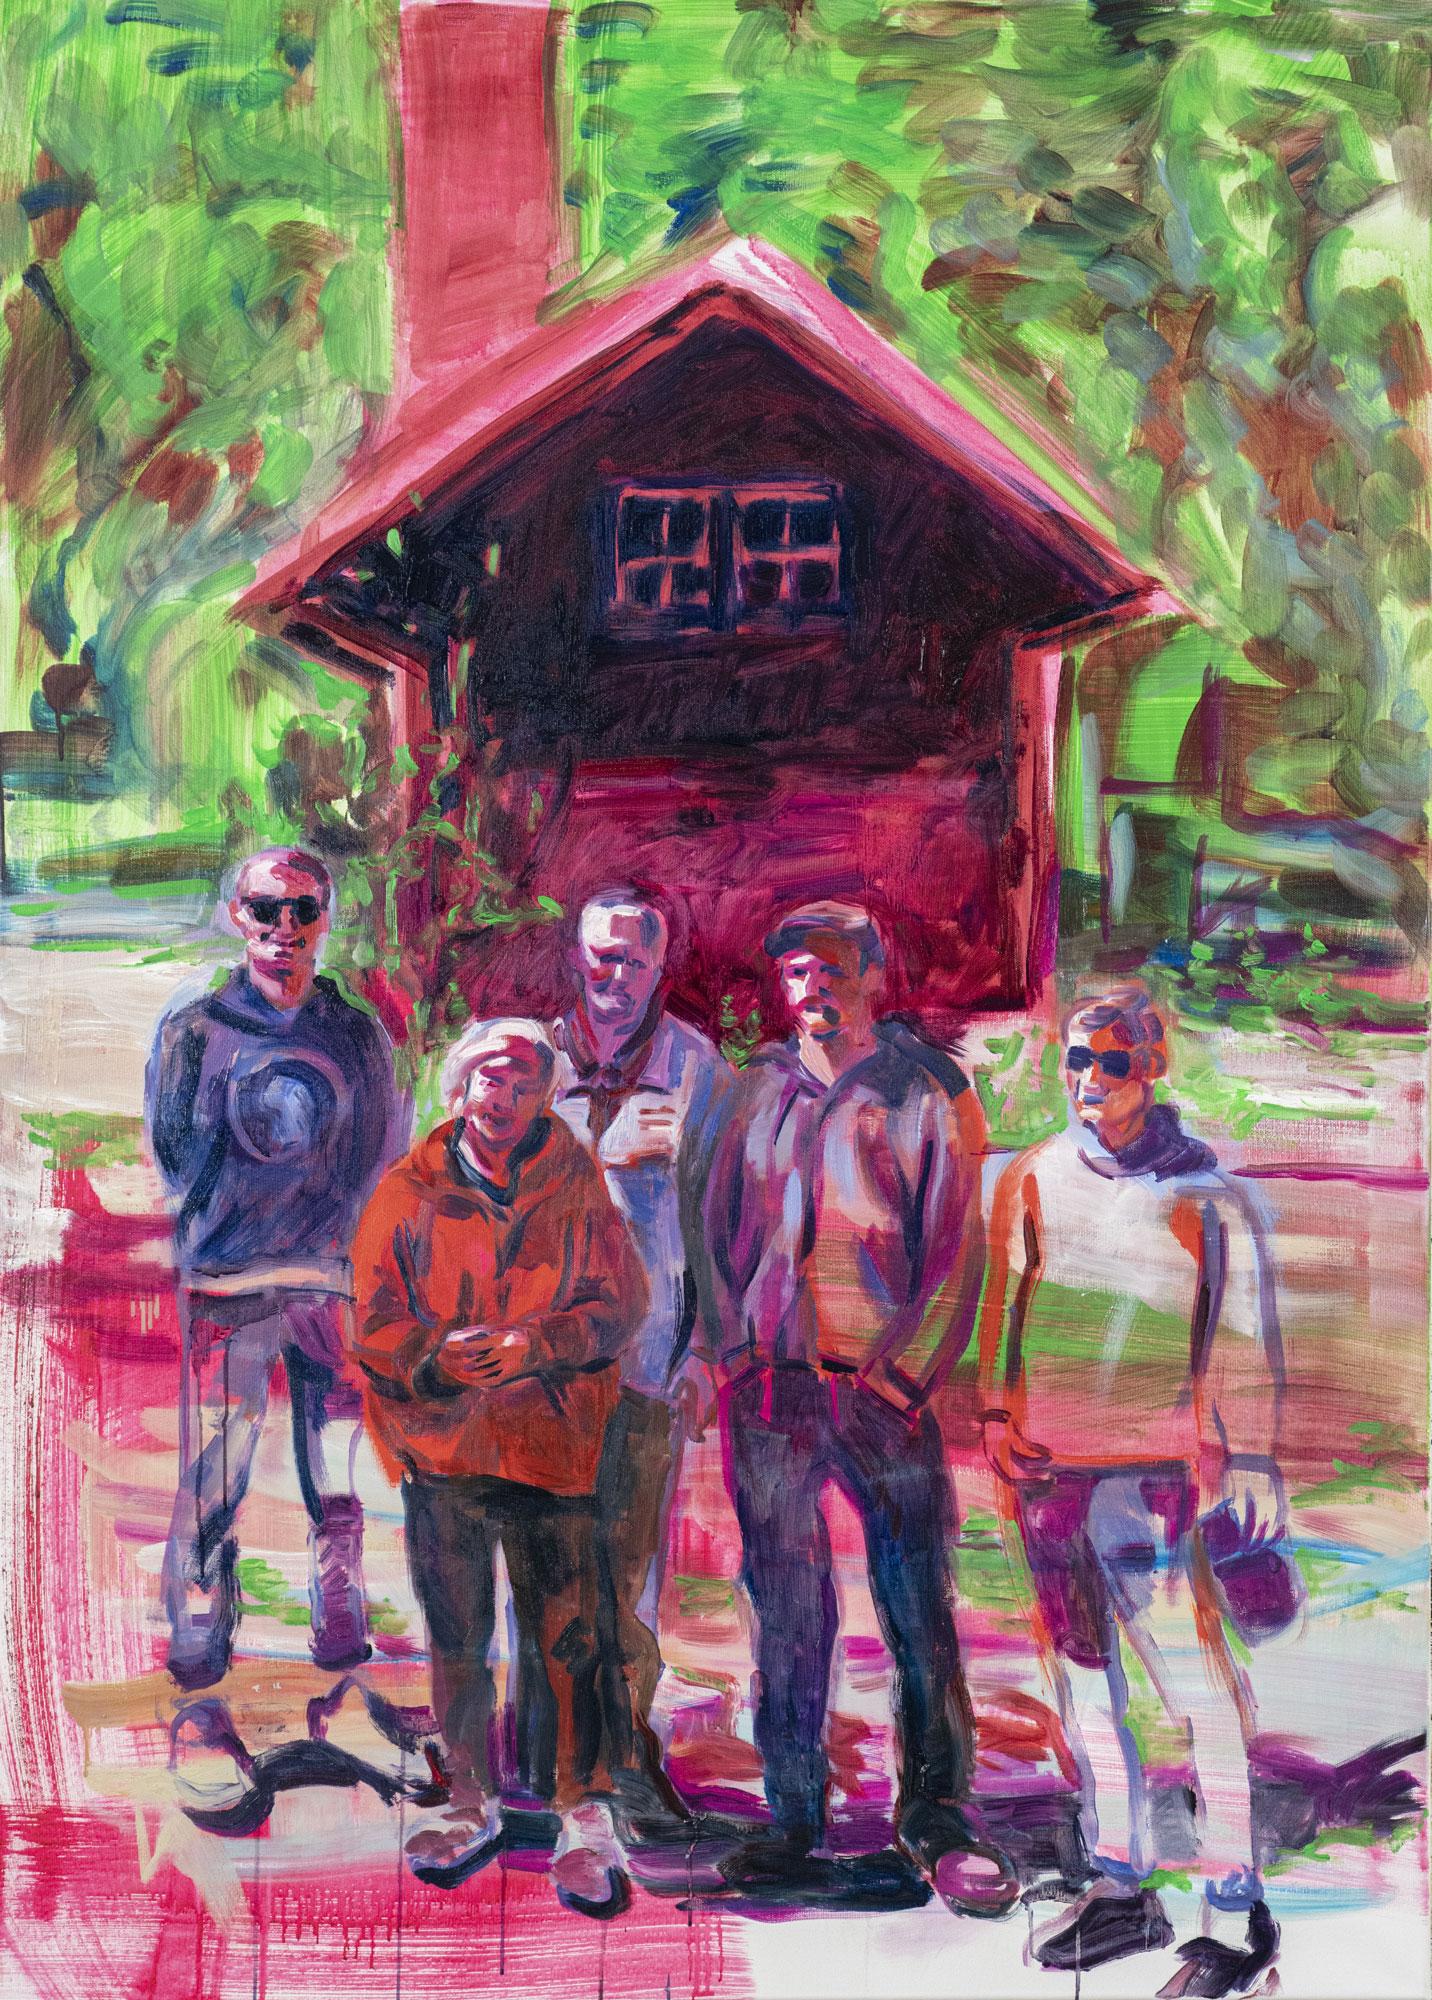 ed gnolos Painting